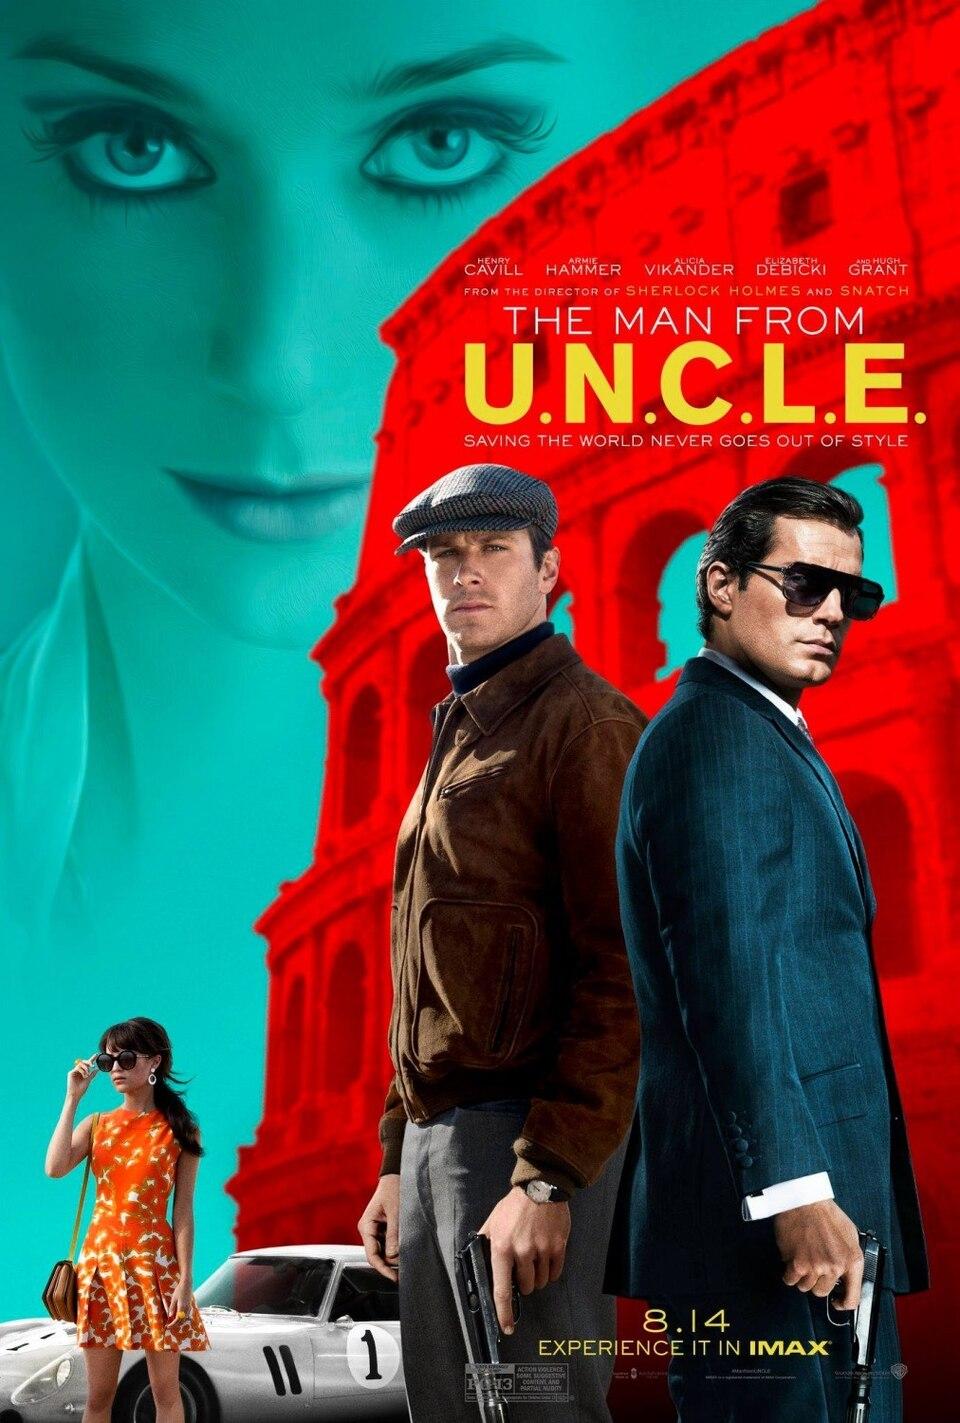 Film The Man from U.N.C.L.E.